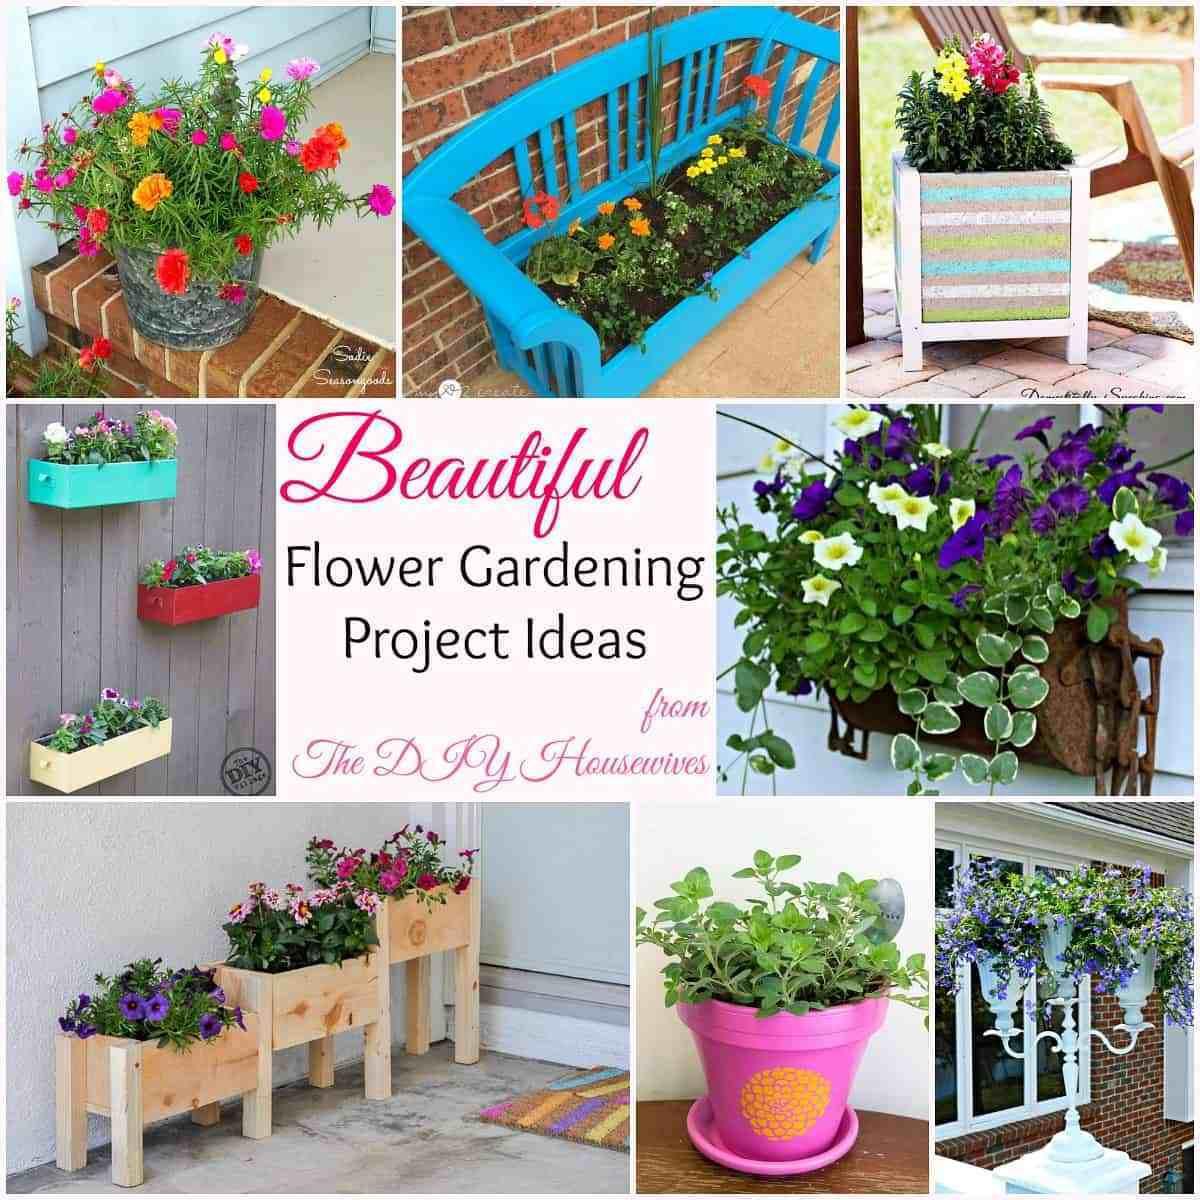 Best ideas about DIY Flower Garden . Save or Pin DIY Flower Gardening Ideas and Planter Projects The DIY Now.